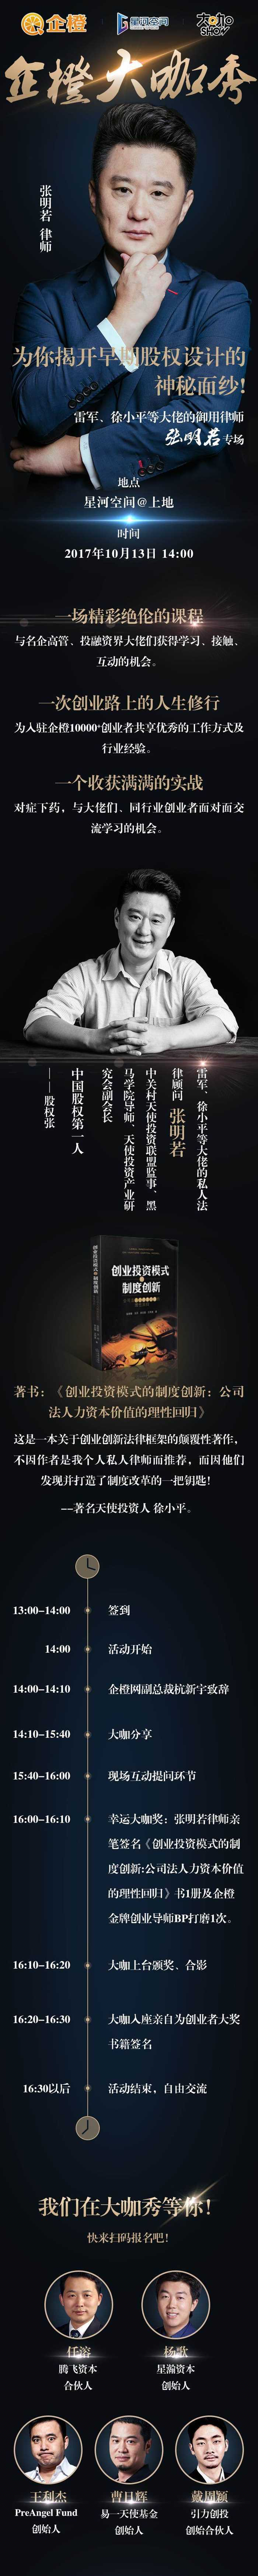 zhangmingruo.png